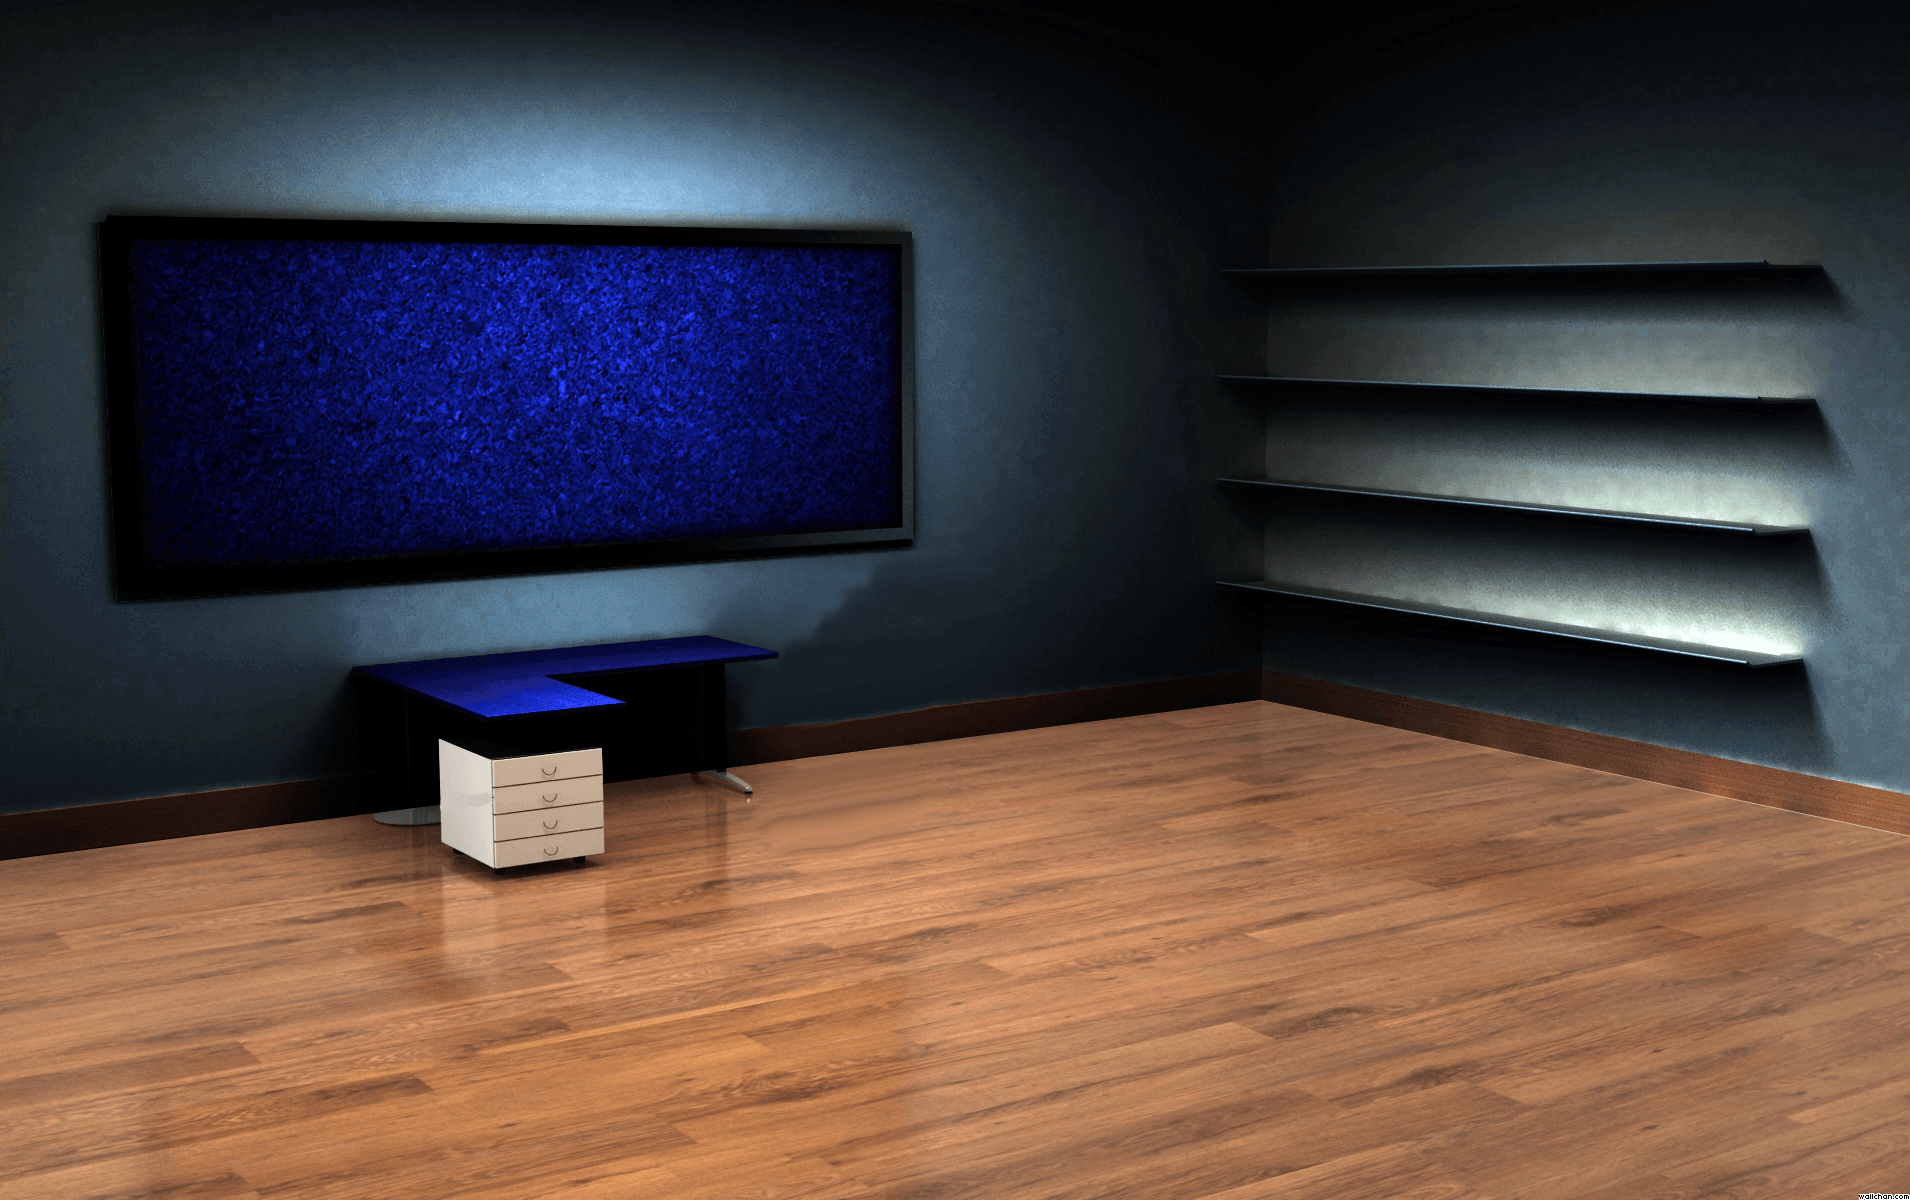 Desktop Office Hd Wallpapers Wallpaper Cave